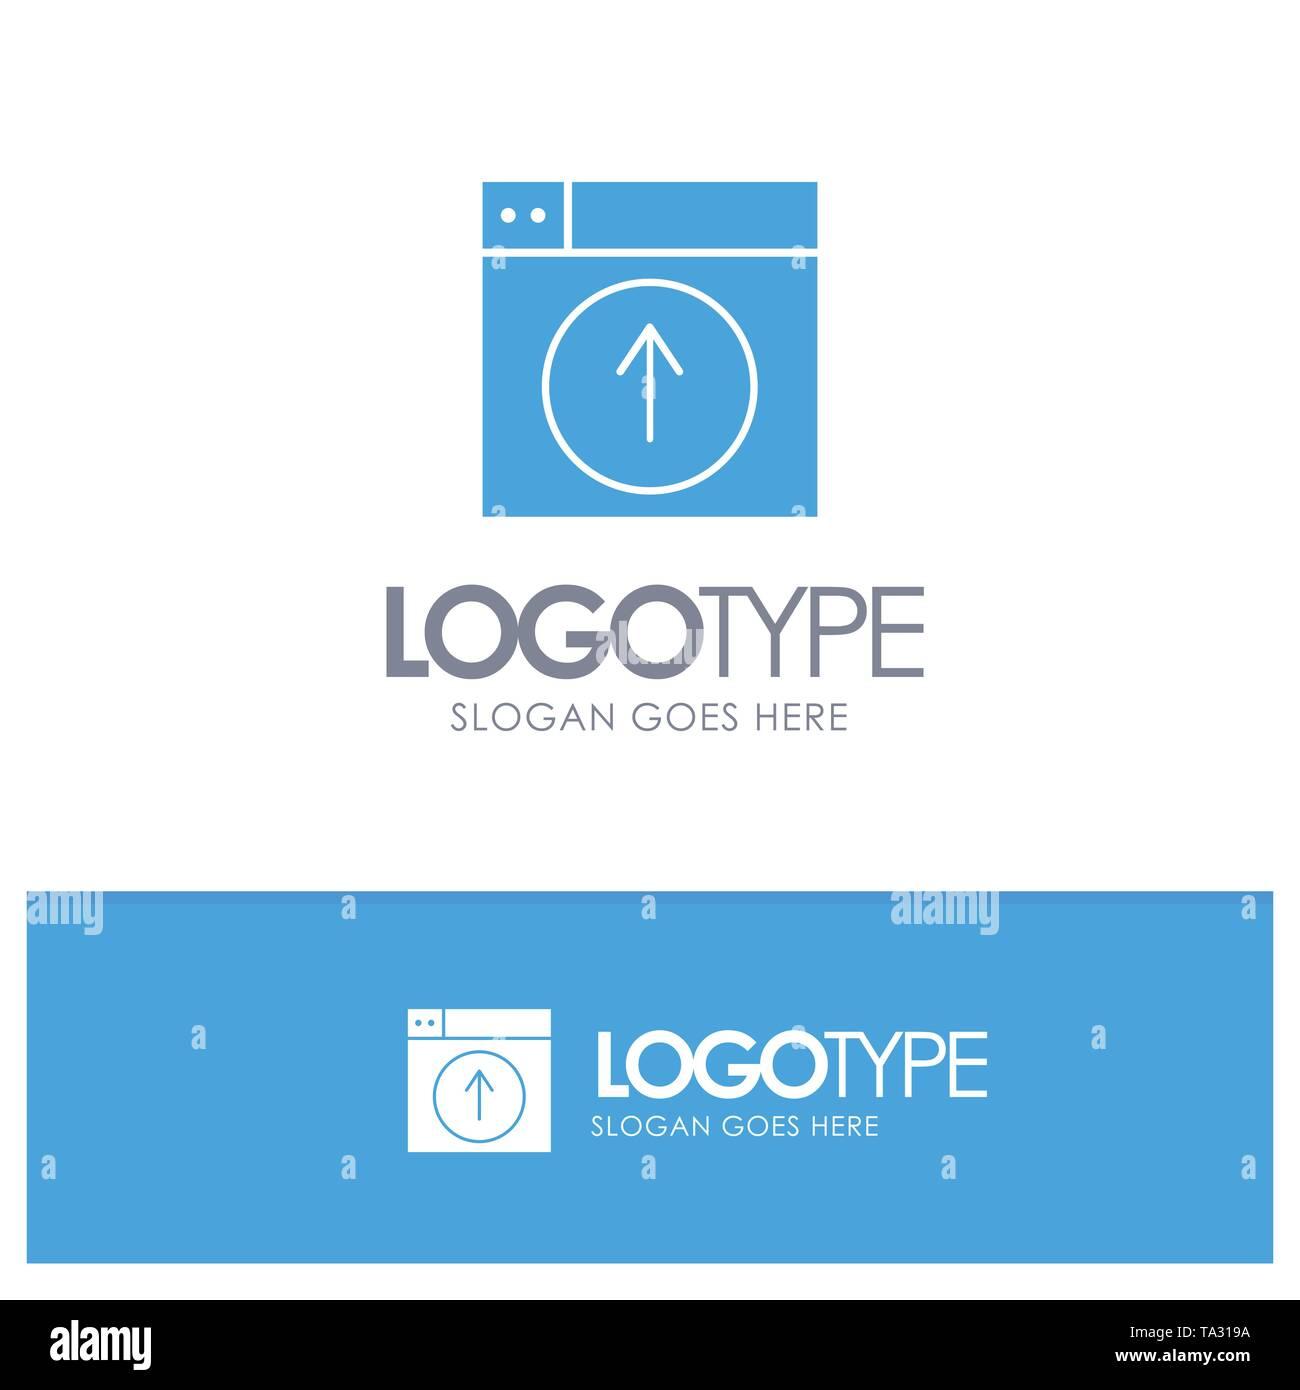 Upload, Up, Web, Design, application Blue Solid Logo with place for tagline - Stock Image